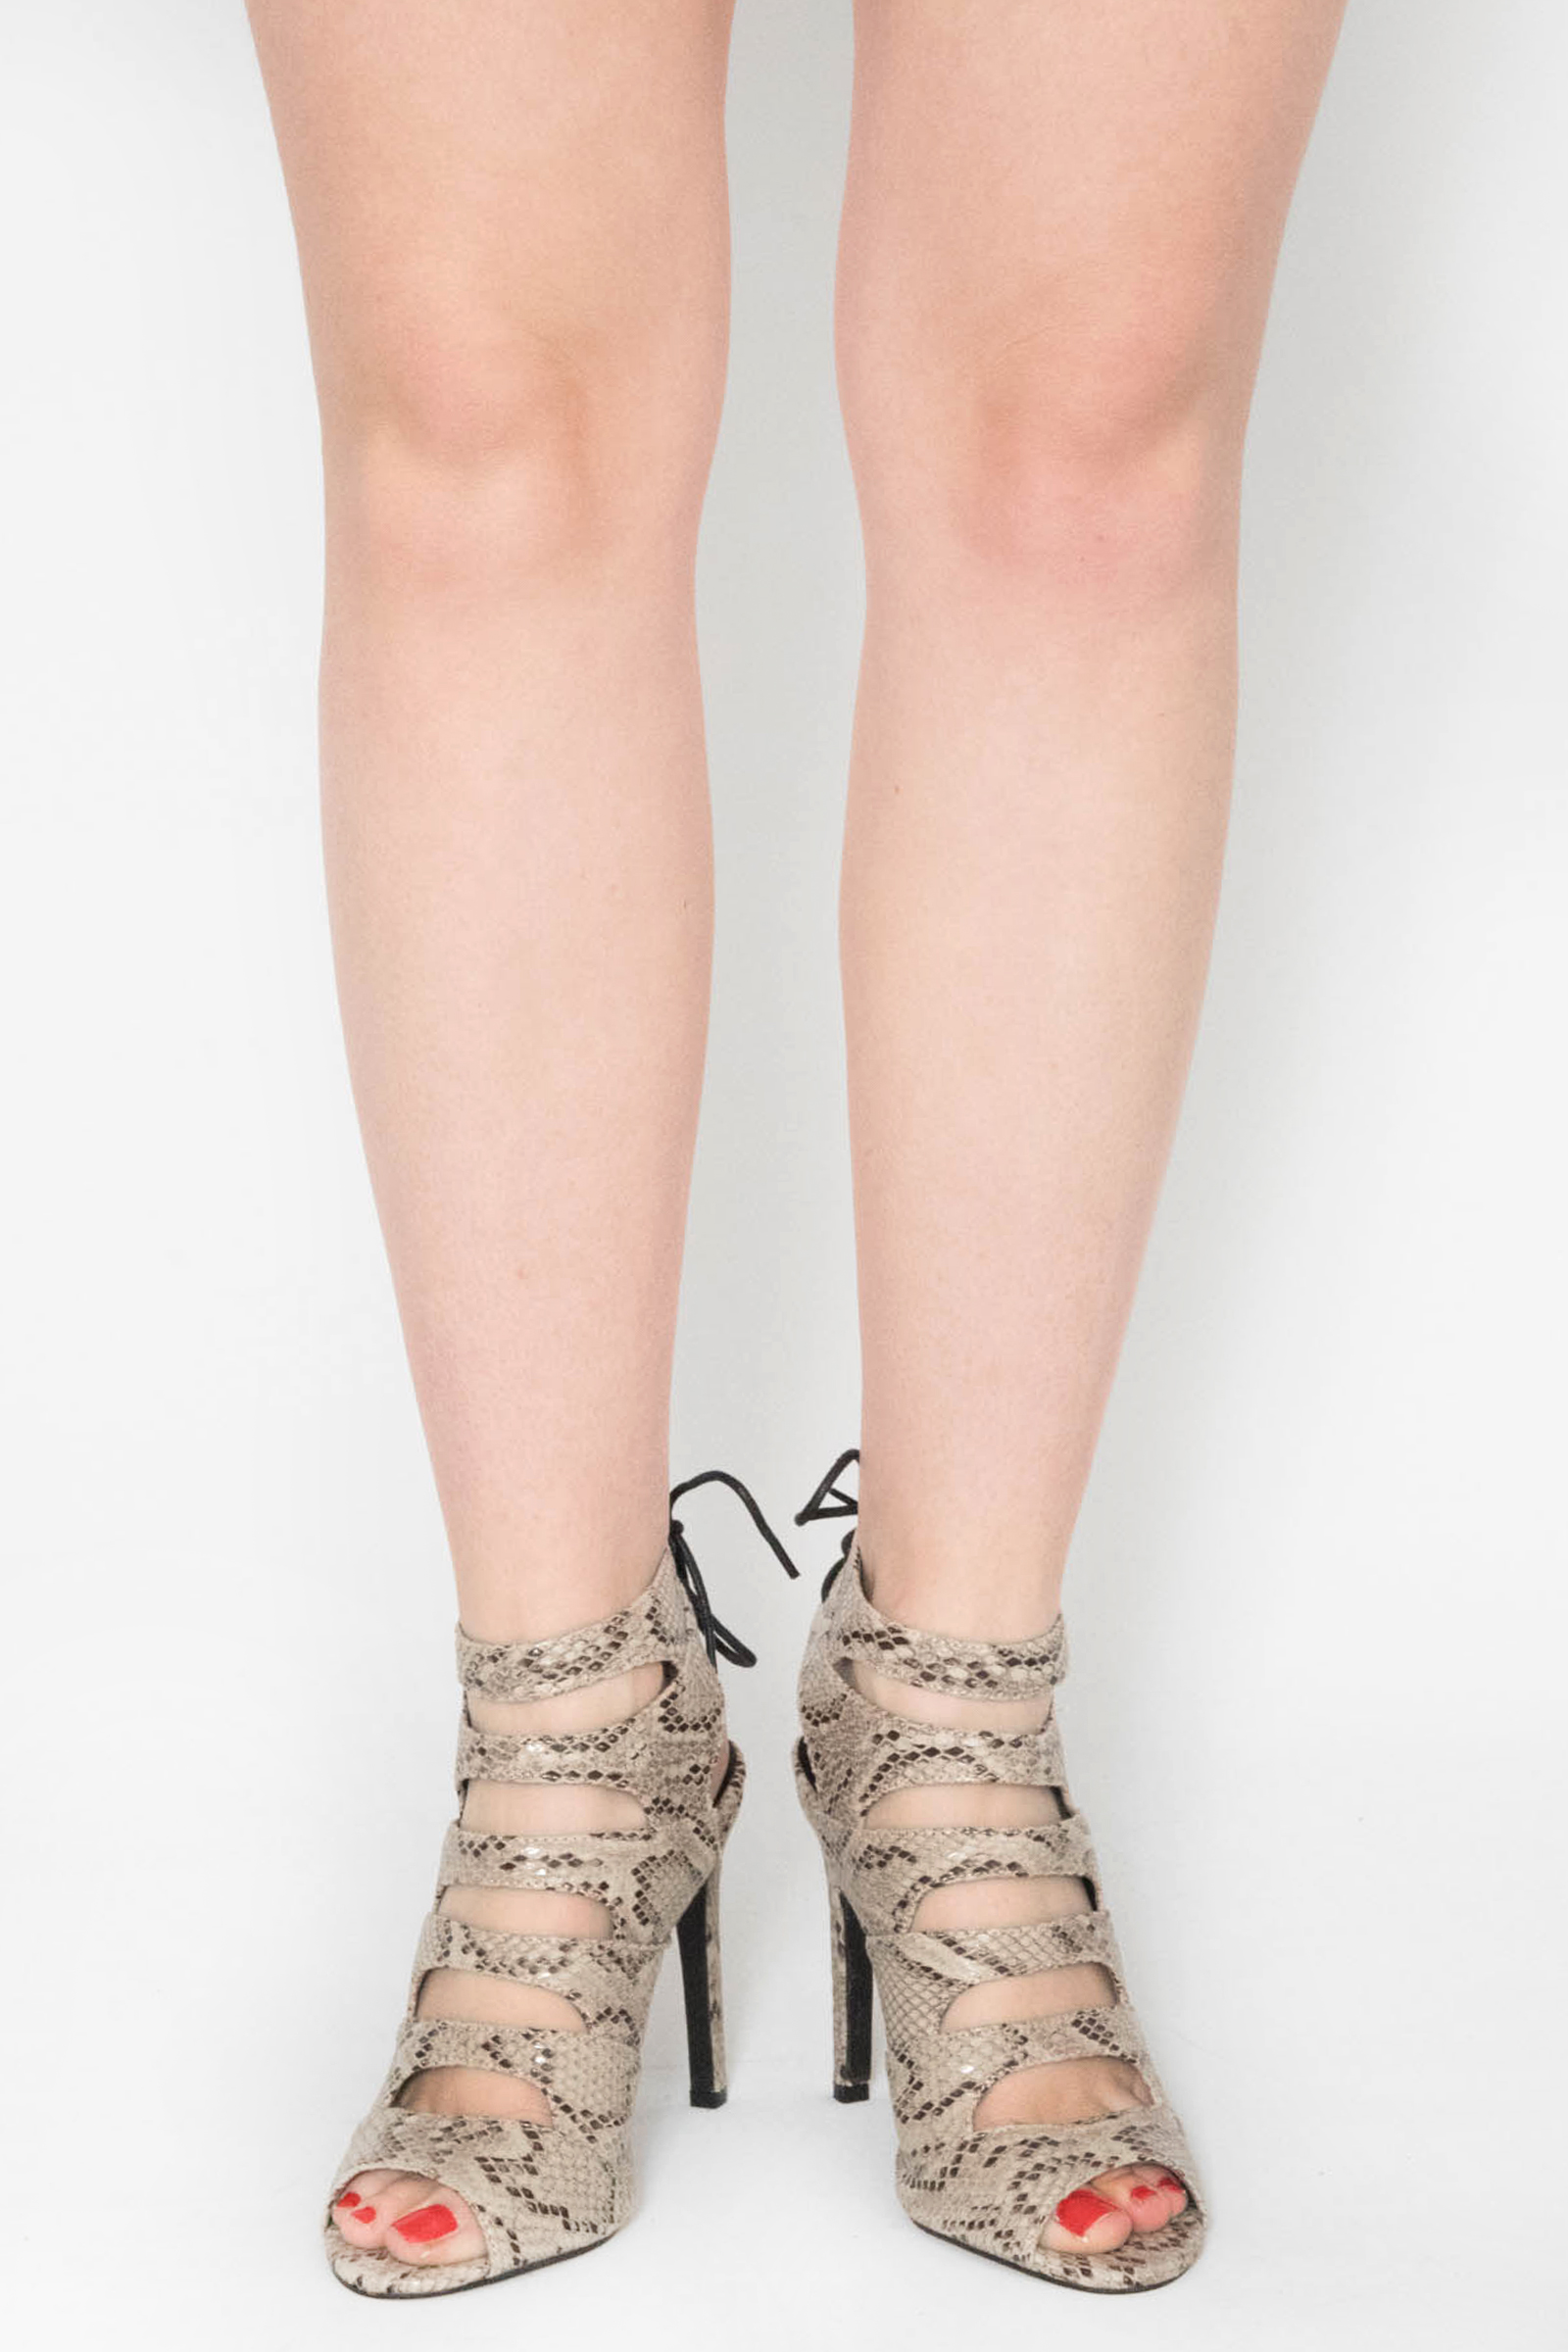 fabd4001b3 Morgan Cream Snake Print Tie Up Heels | Shoes | Modamore